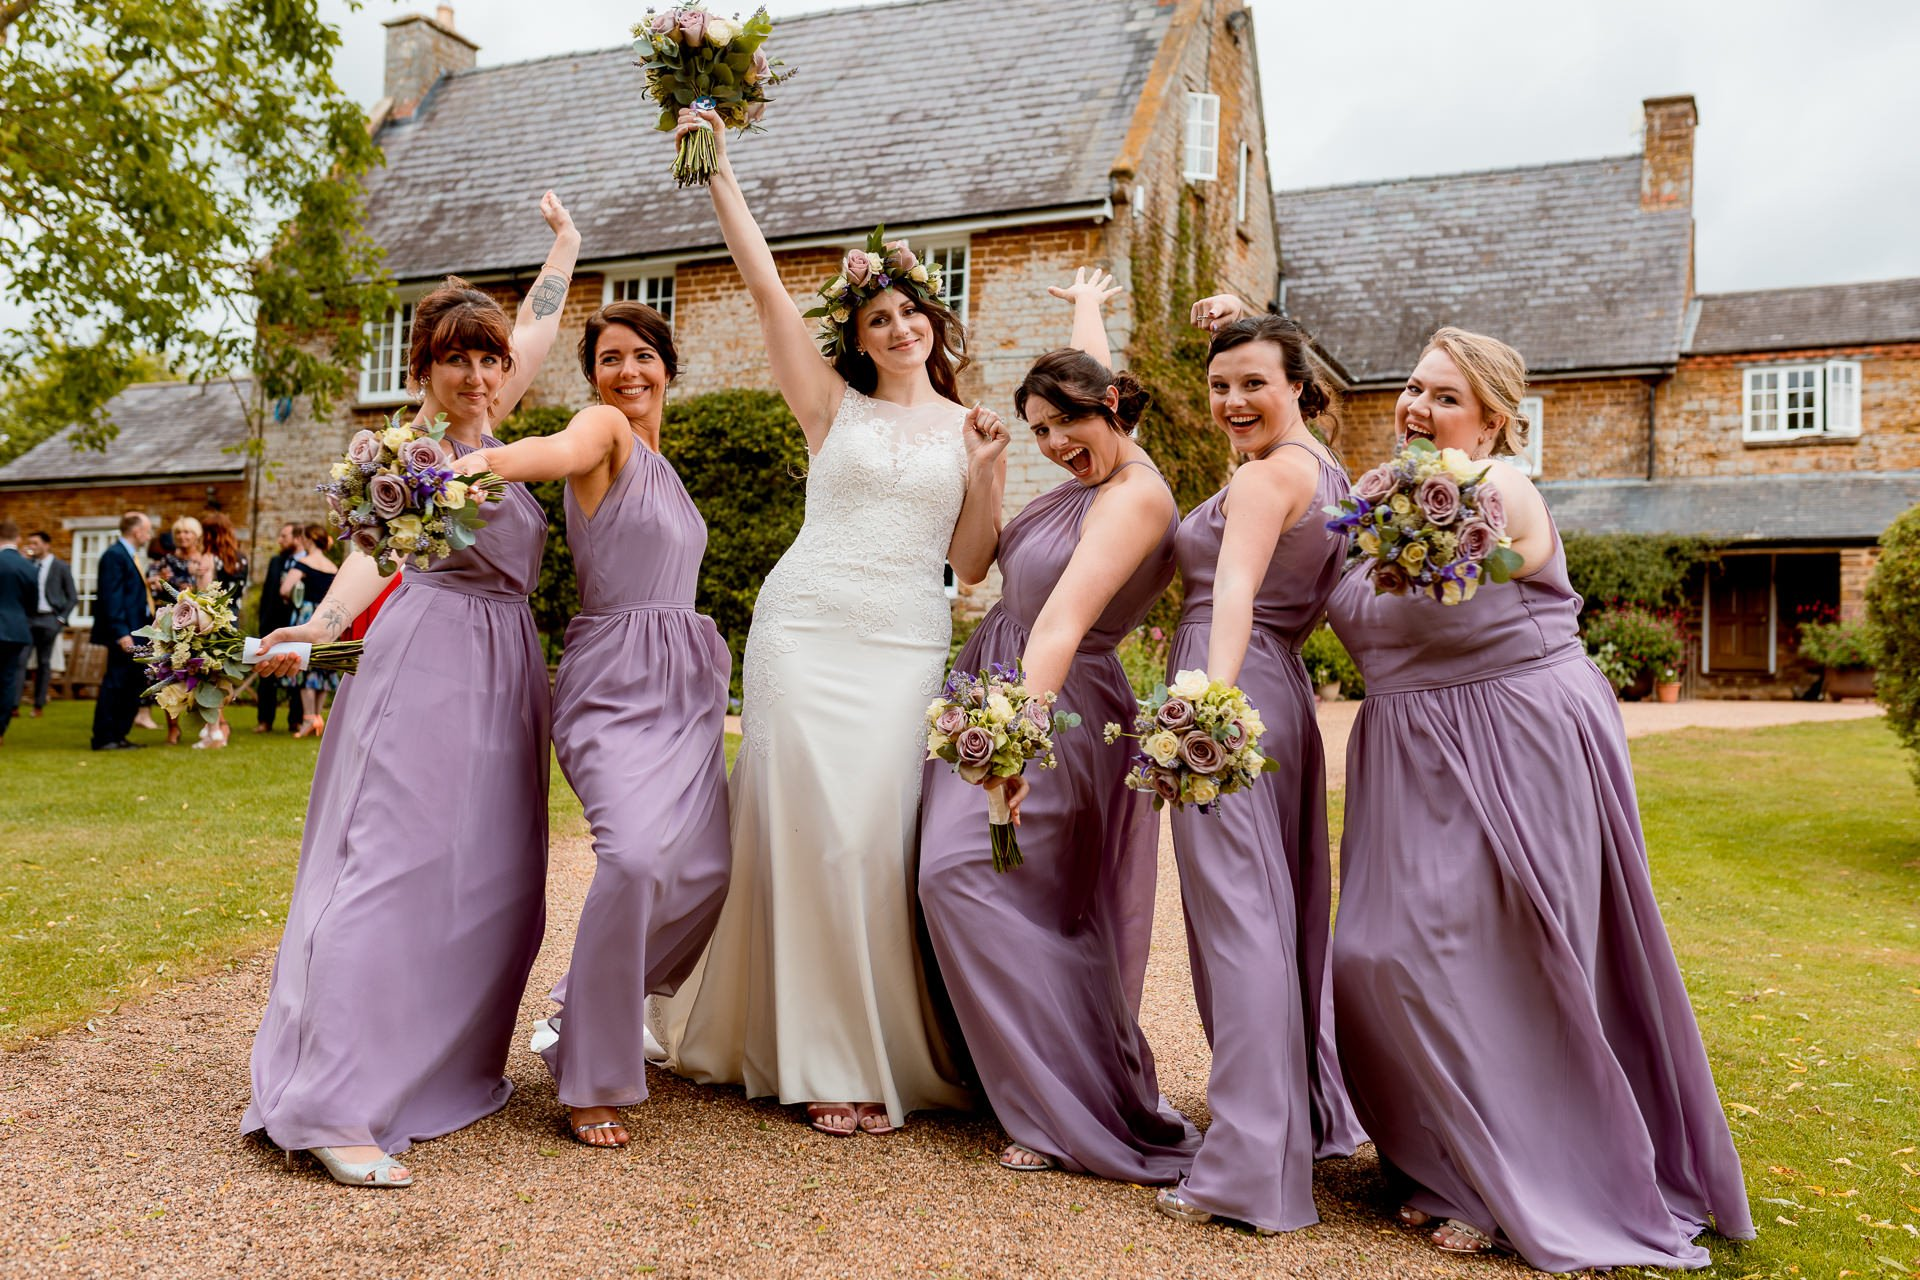 Oxford Wedding Event Photographer Crockwell Farm